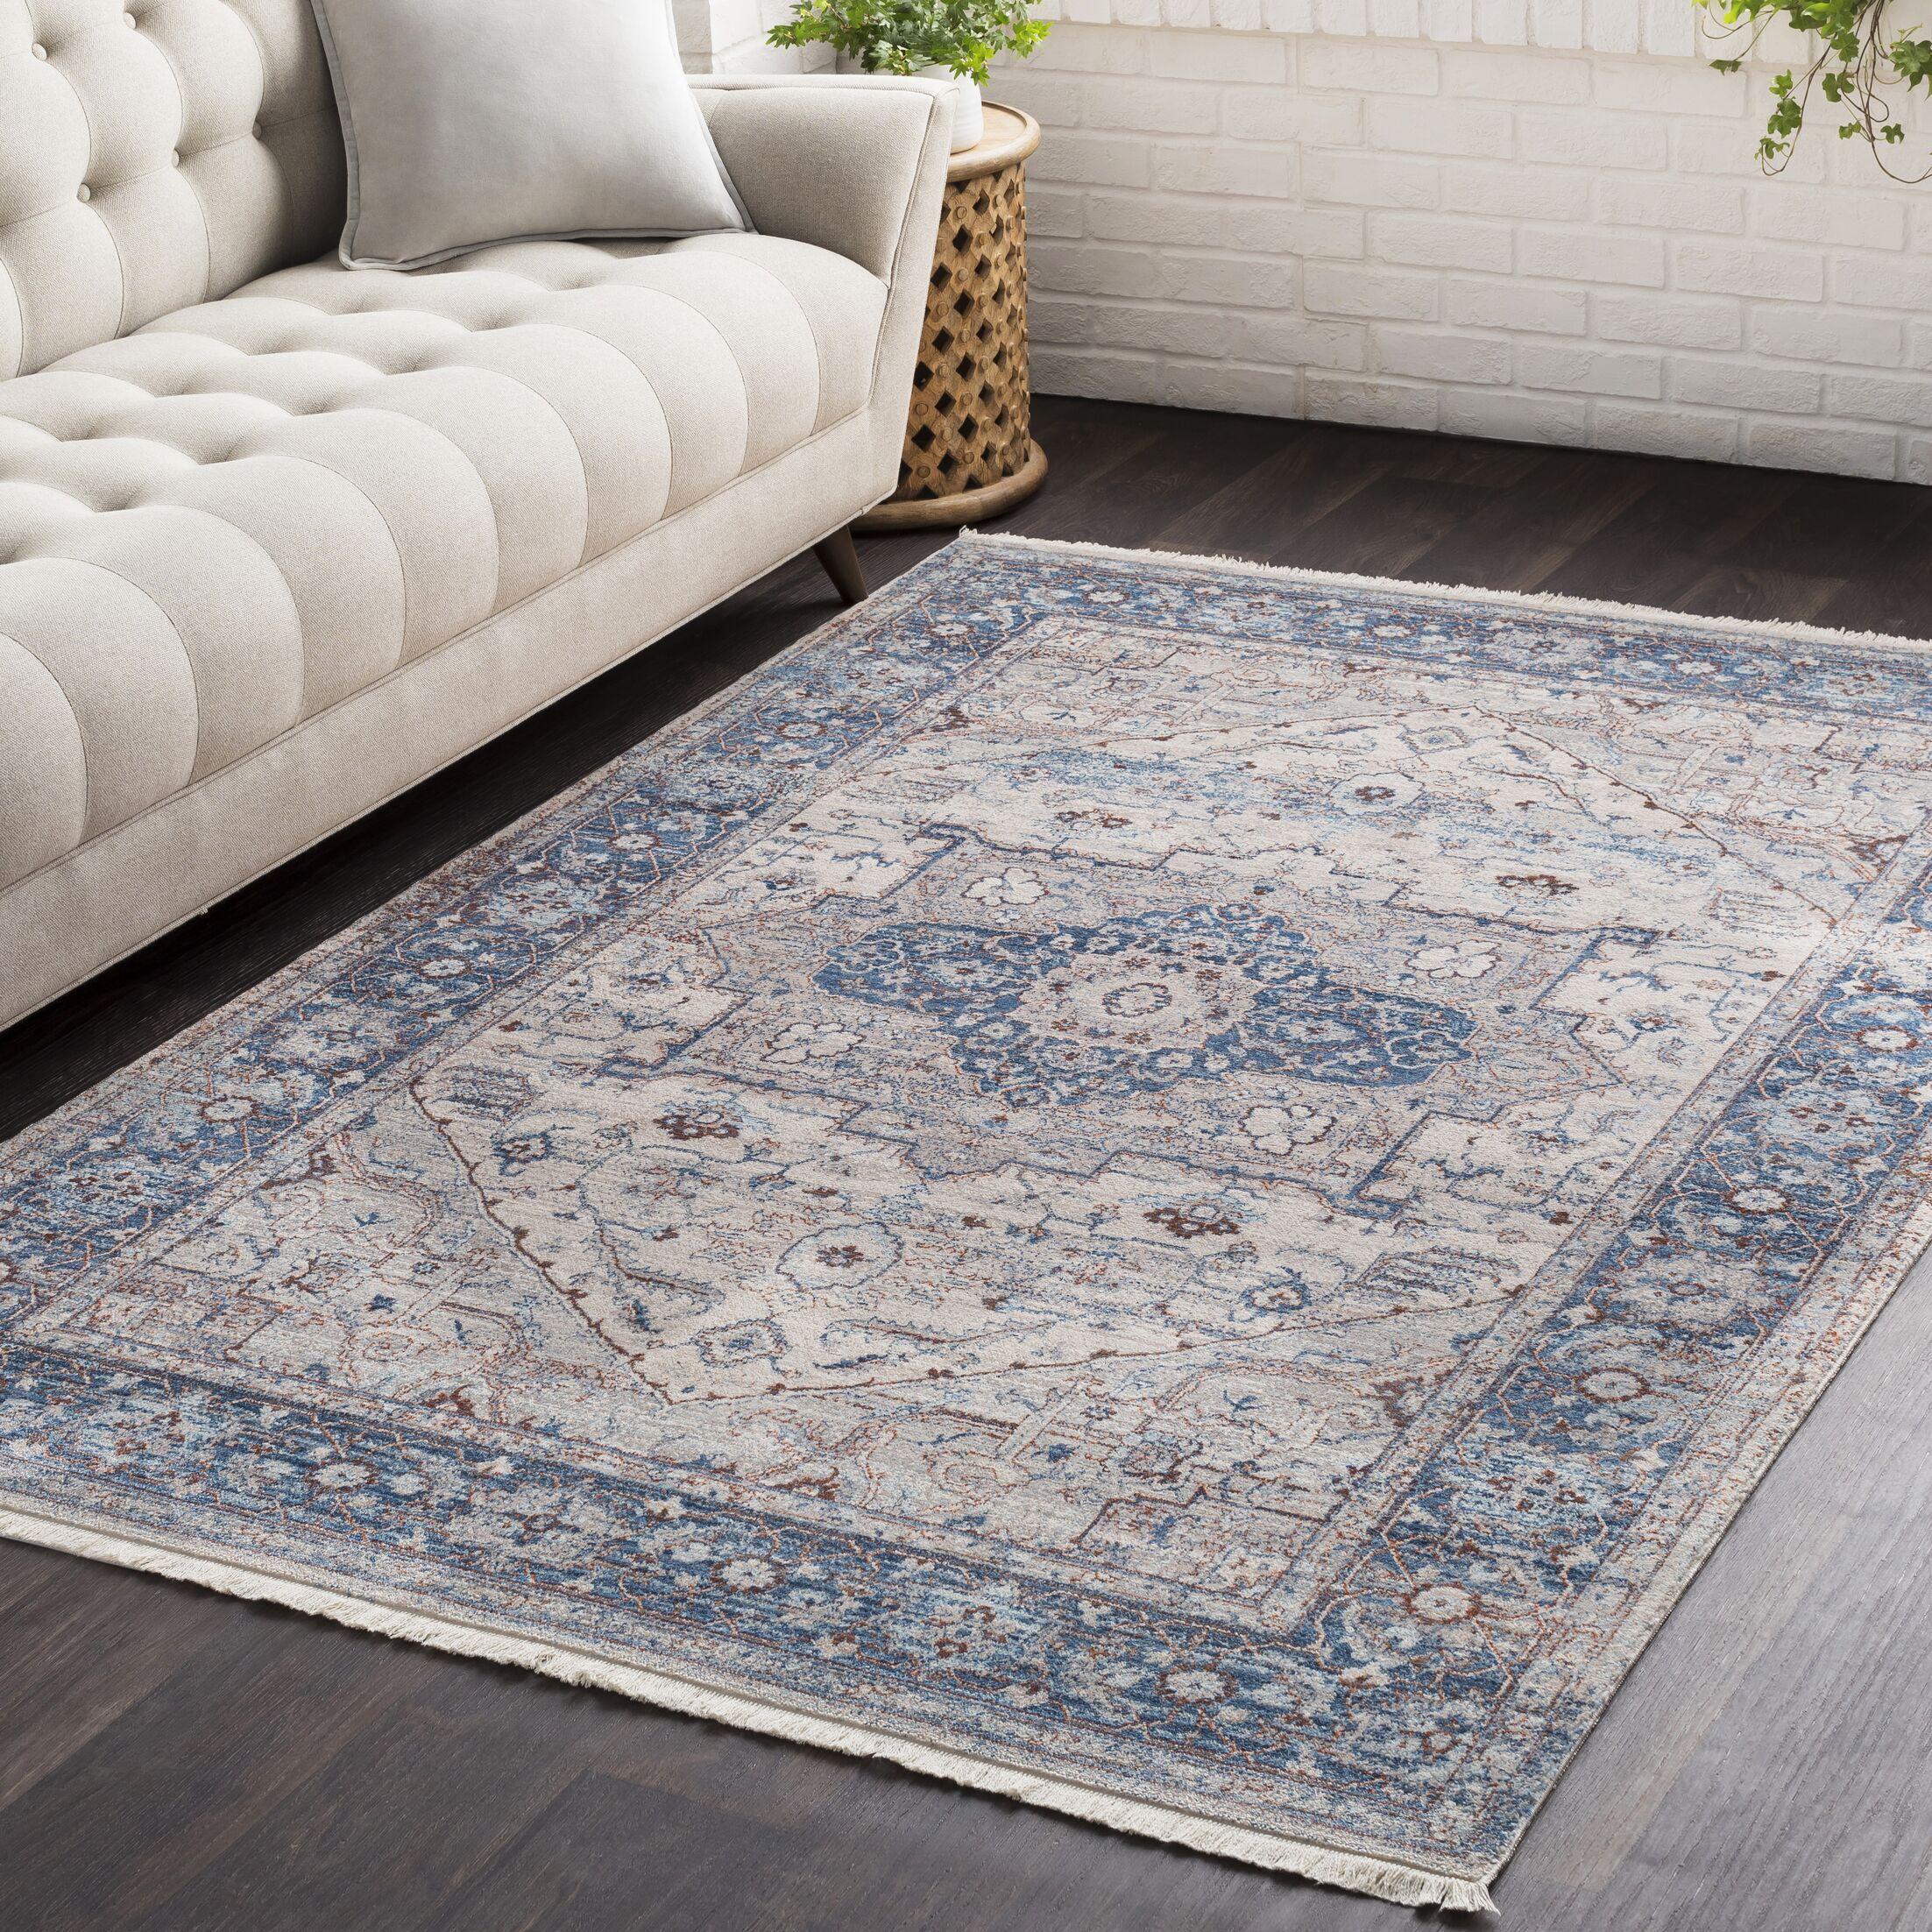 Mendelsohn Oriental Vintage Persian Traditional Blue/Cream Area Rug Rug Size: Rectangle 5' x 7'9